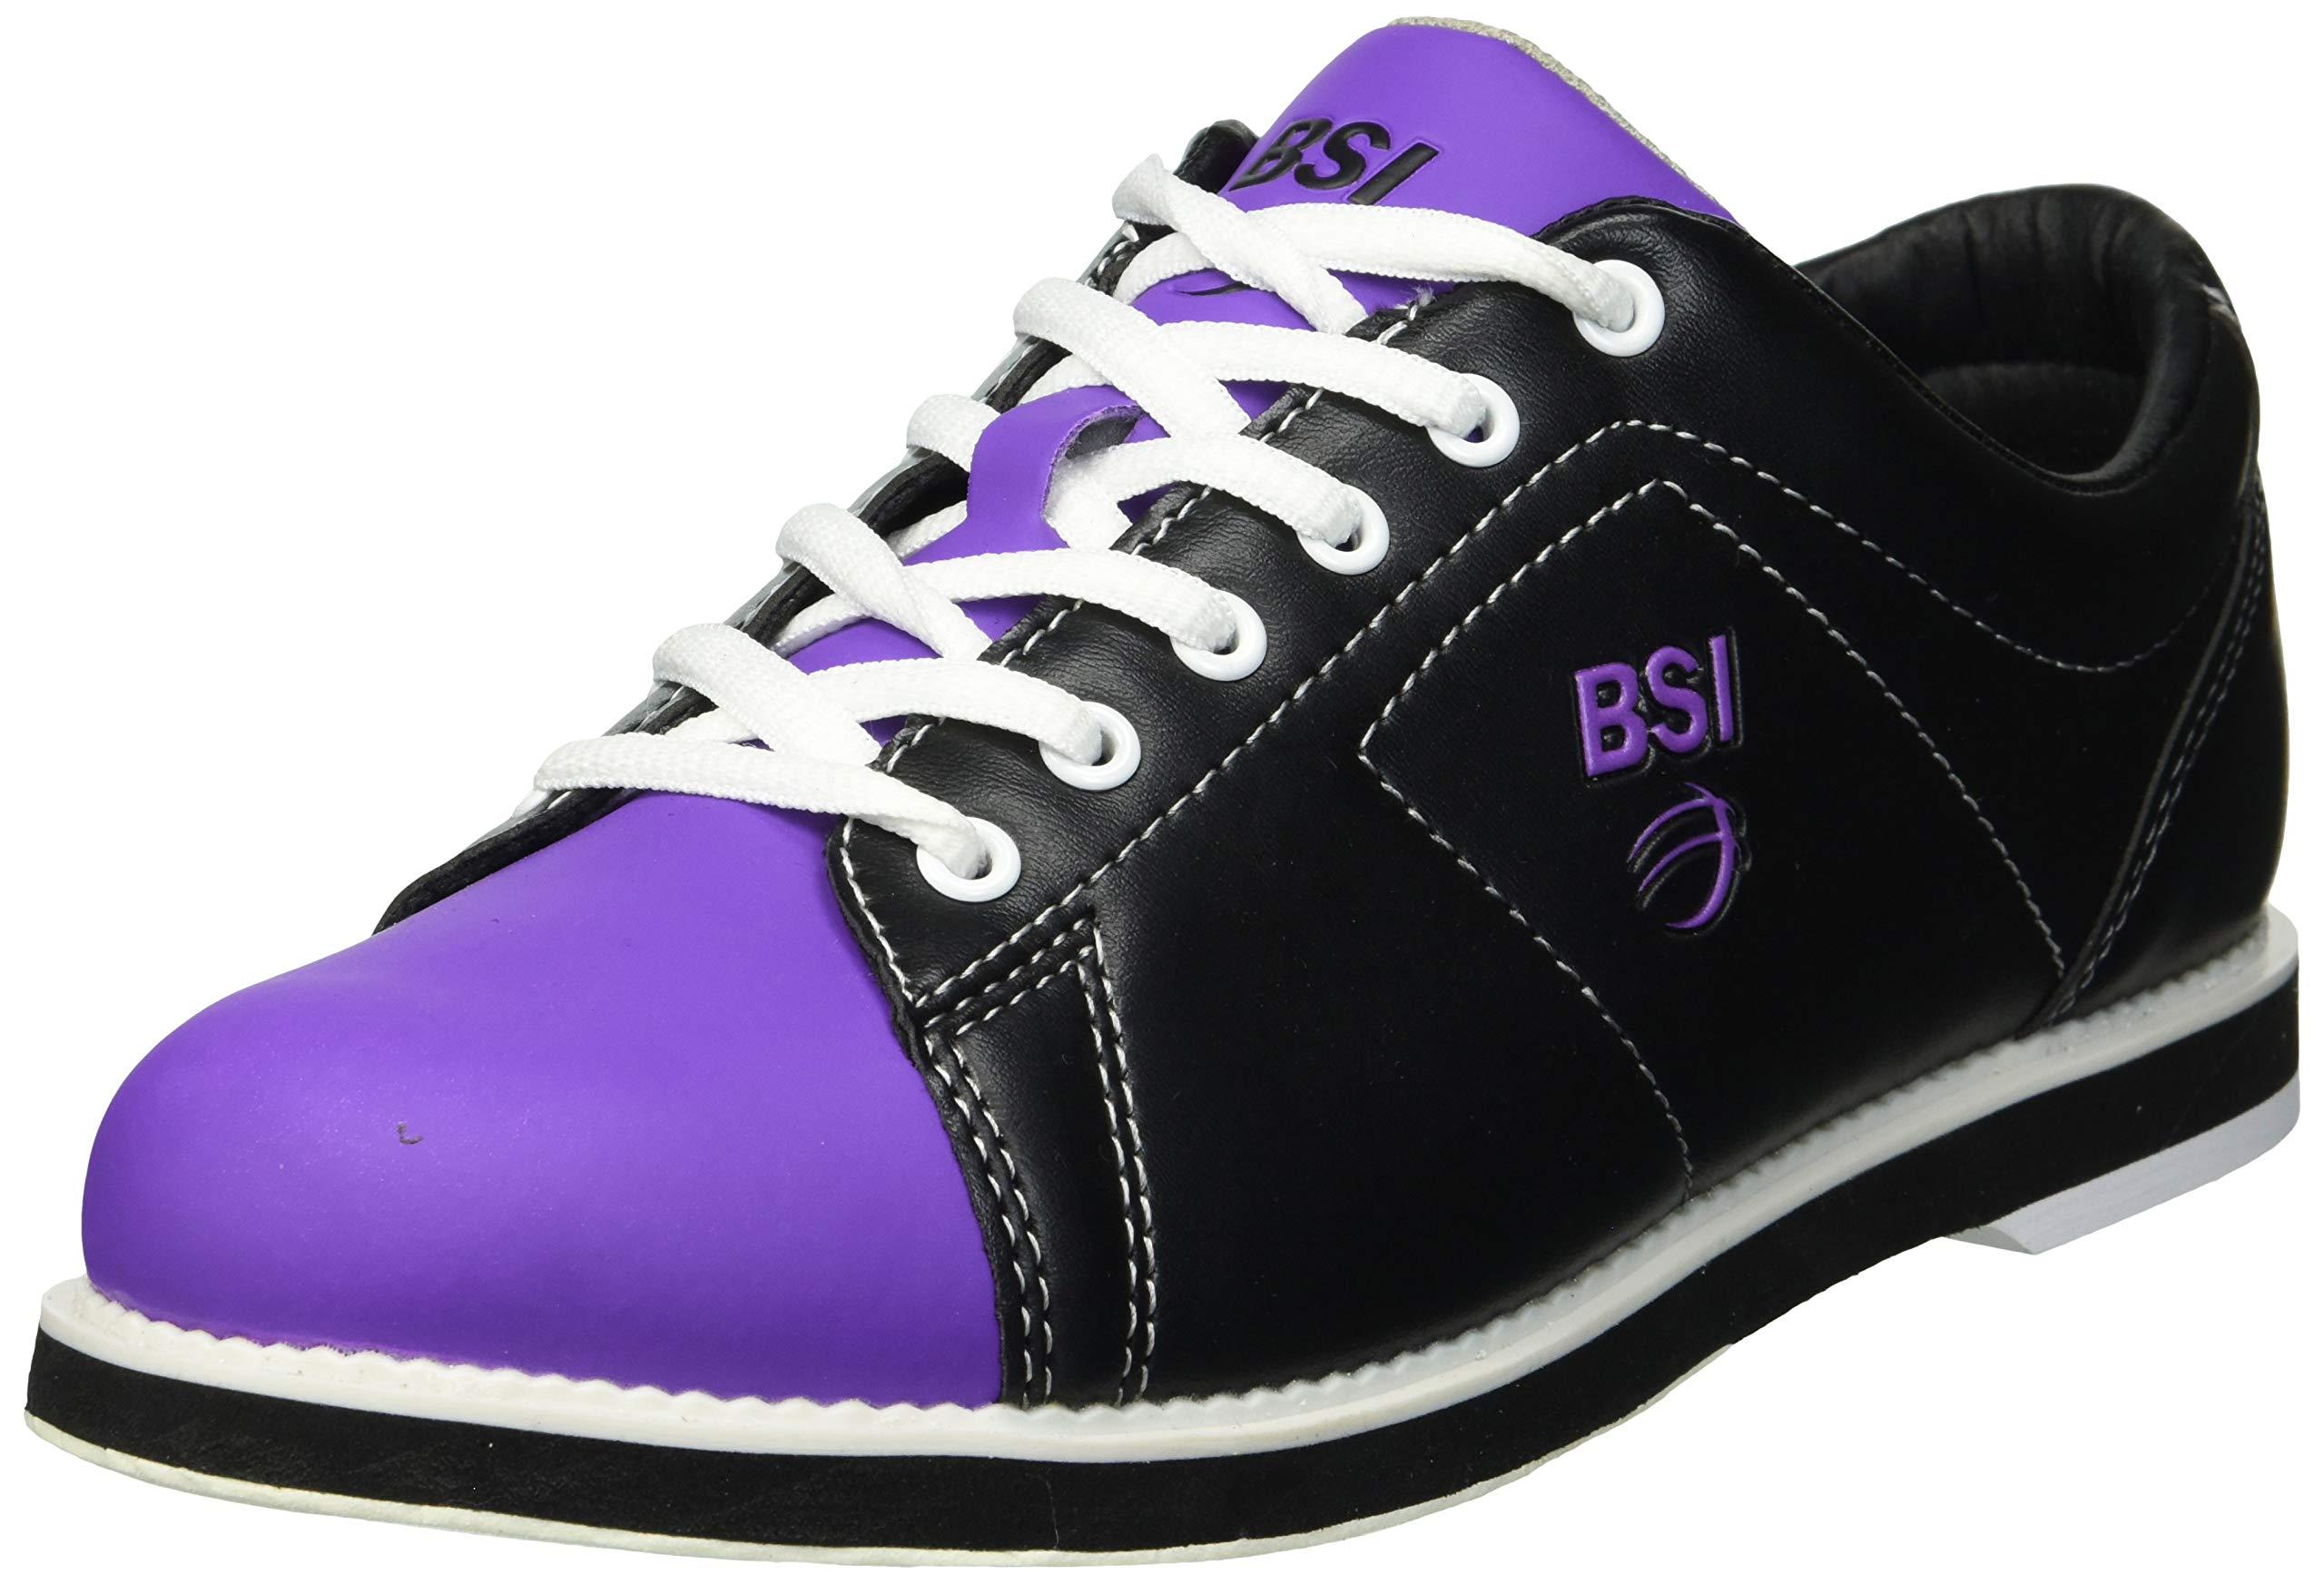 BSI 654 Women's Classic #654, Black/Purple, 9.5 by BSI